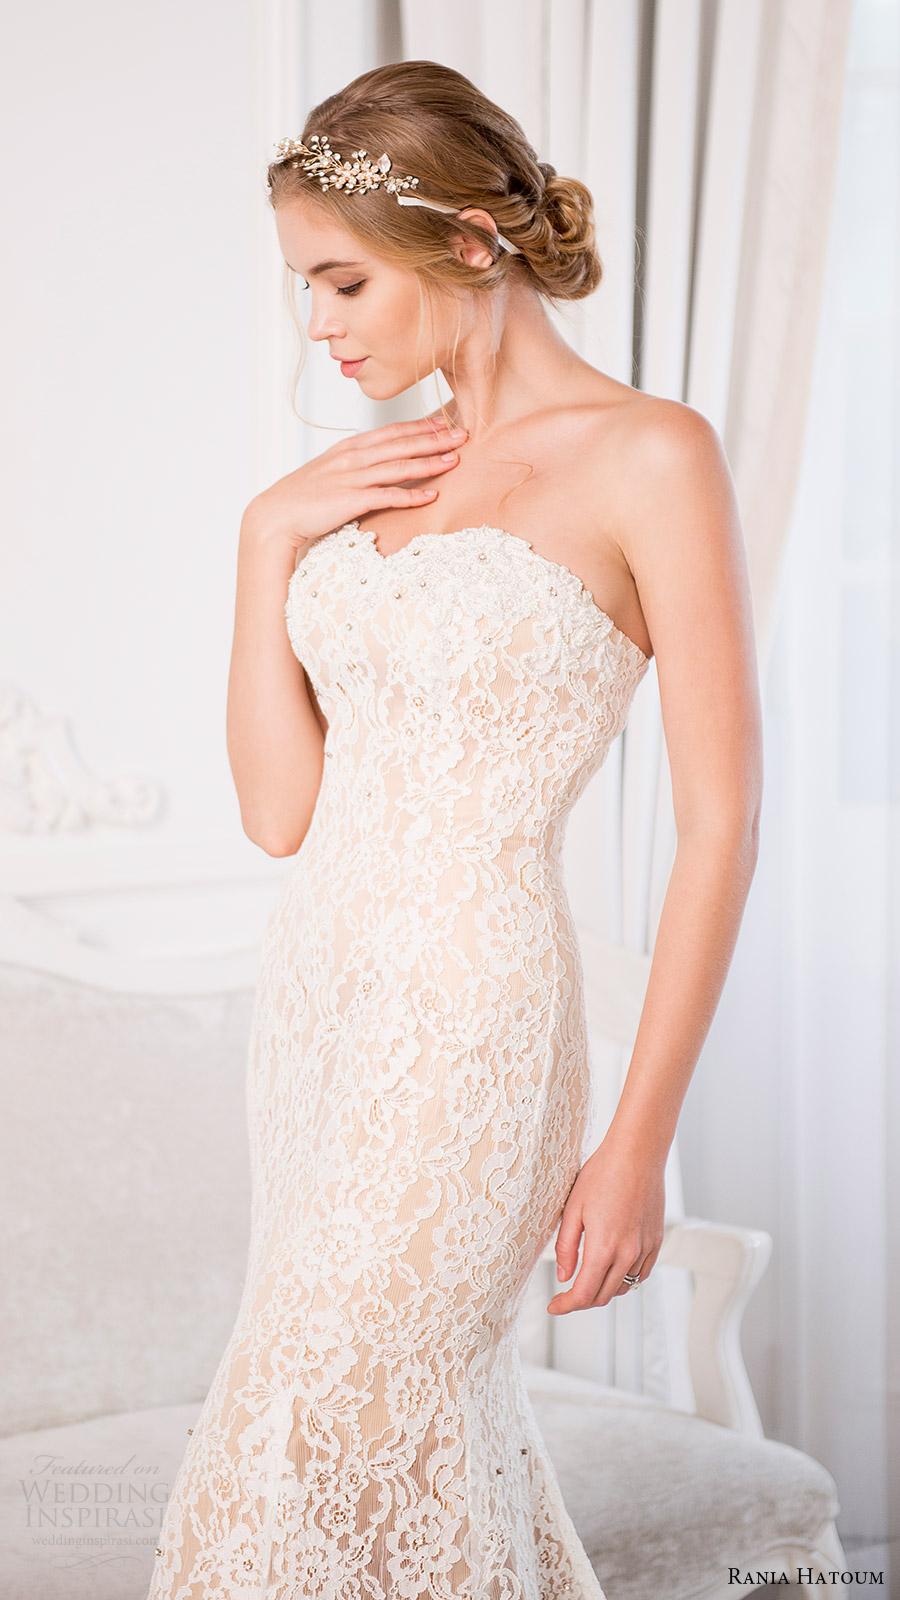 rania hatoum bridal spring 2017 strapless sweetheart sheath lace wedding dress (eiffel) zfv train